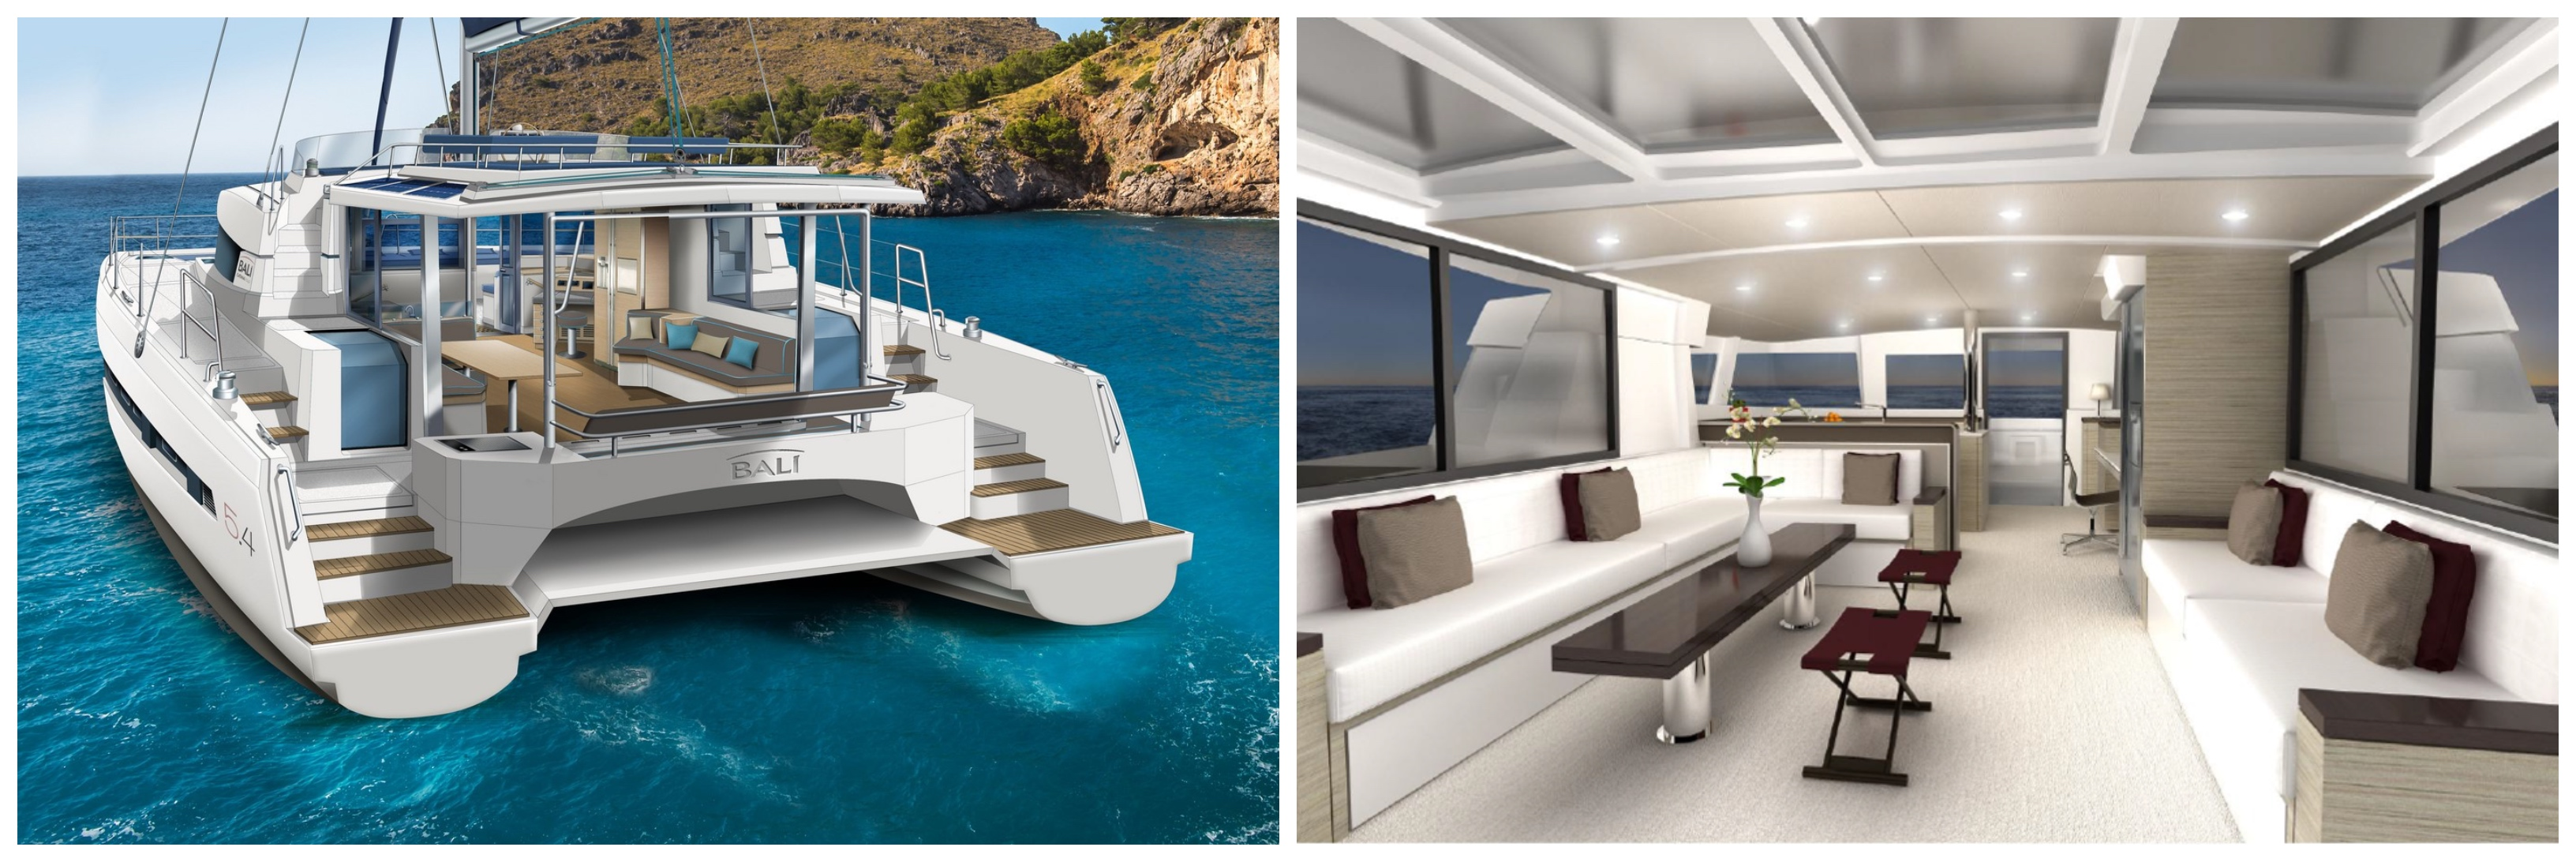 bali-5-4-fuente_-bali-catamarans-official-page